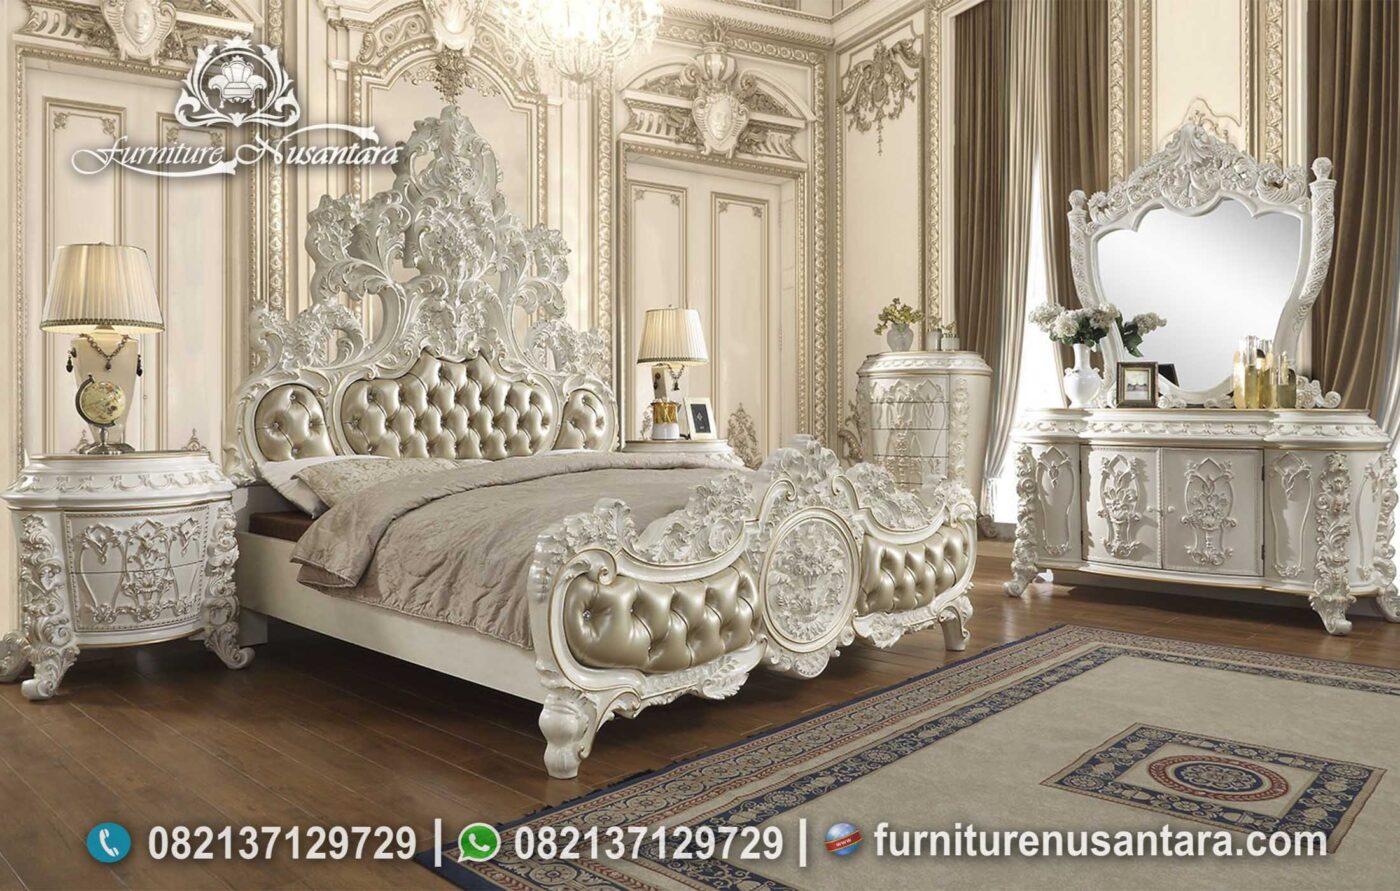 Tempat Tidur Raja Ukir Putih Mutiara KS-187, Furniture Nusantara